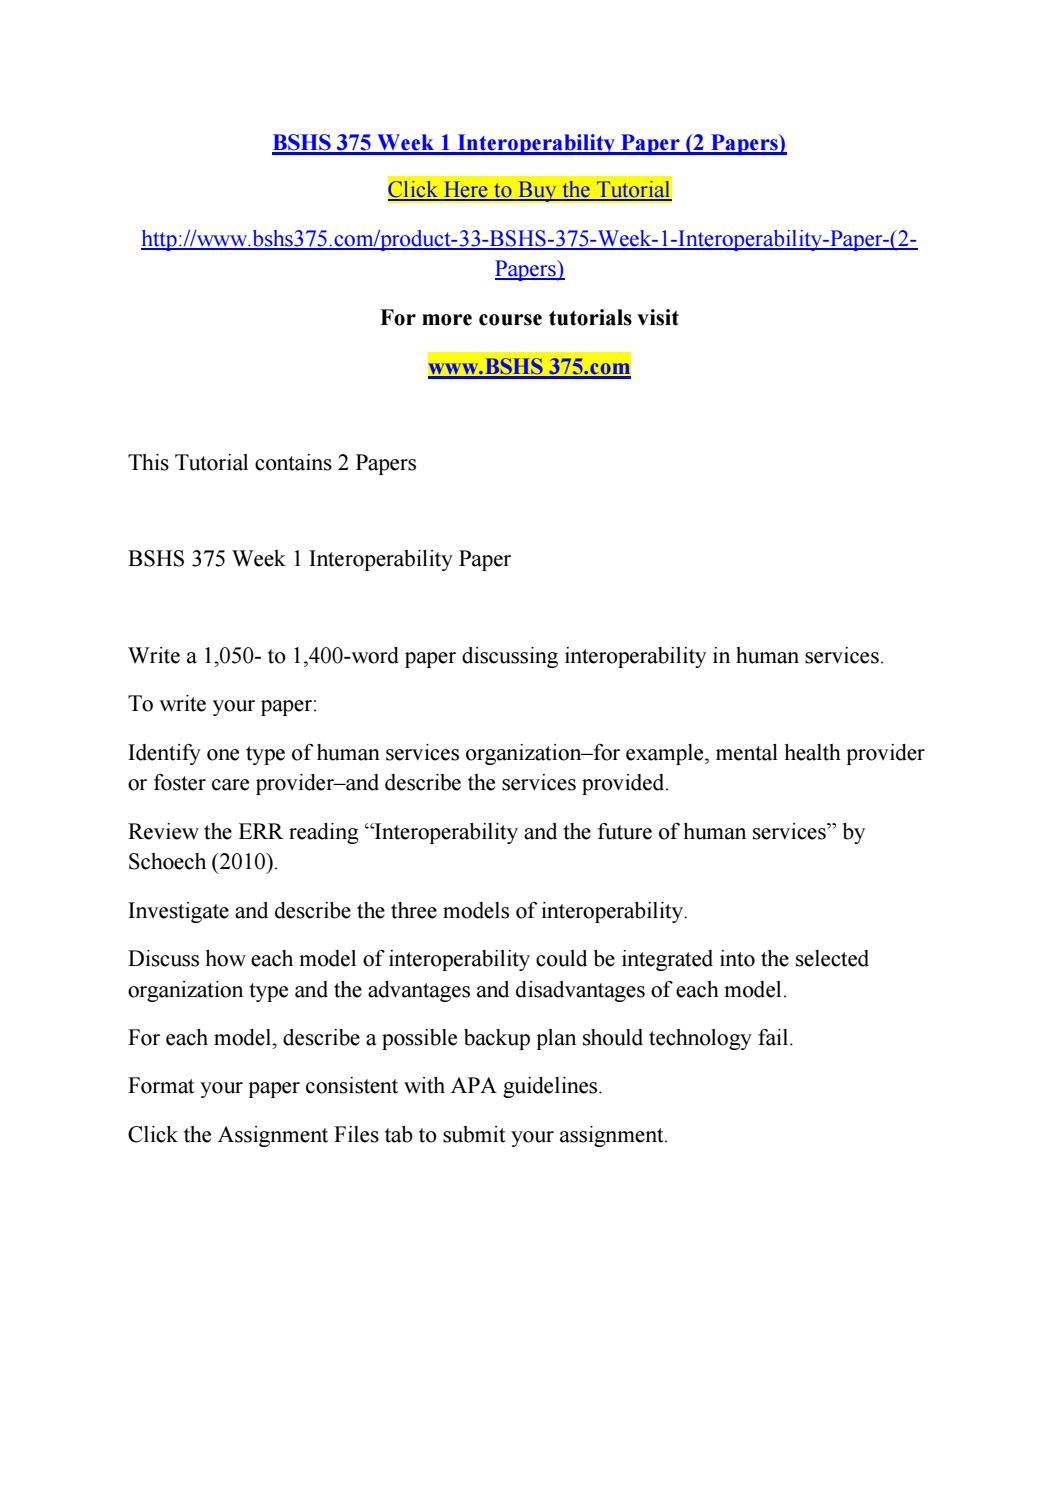 interoperability paper bshs 375 View homework help - interoperability paper from bshs 375 at university of phoenix interoperability paper interoperability paper brandi frost bshs/375 11/23/2015 nicole nightingale november 23.